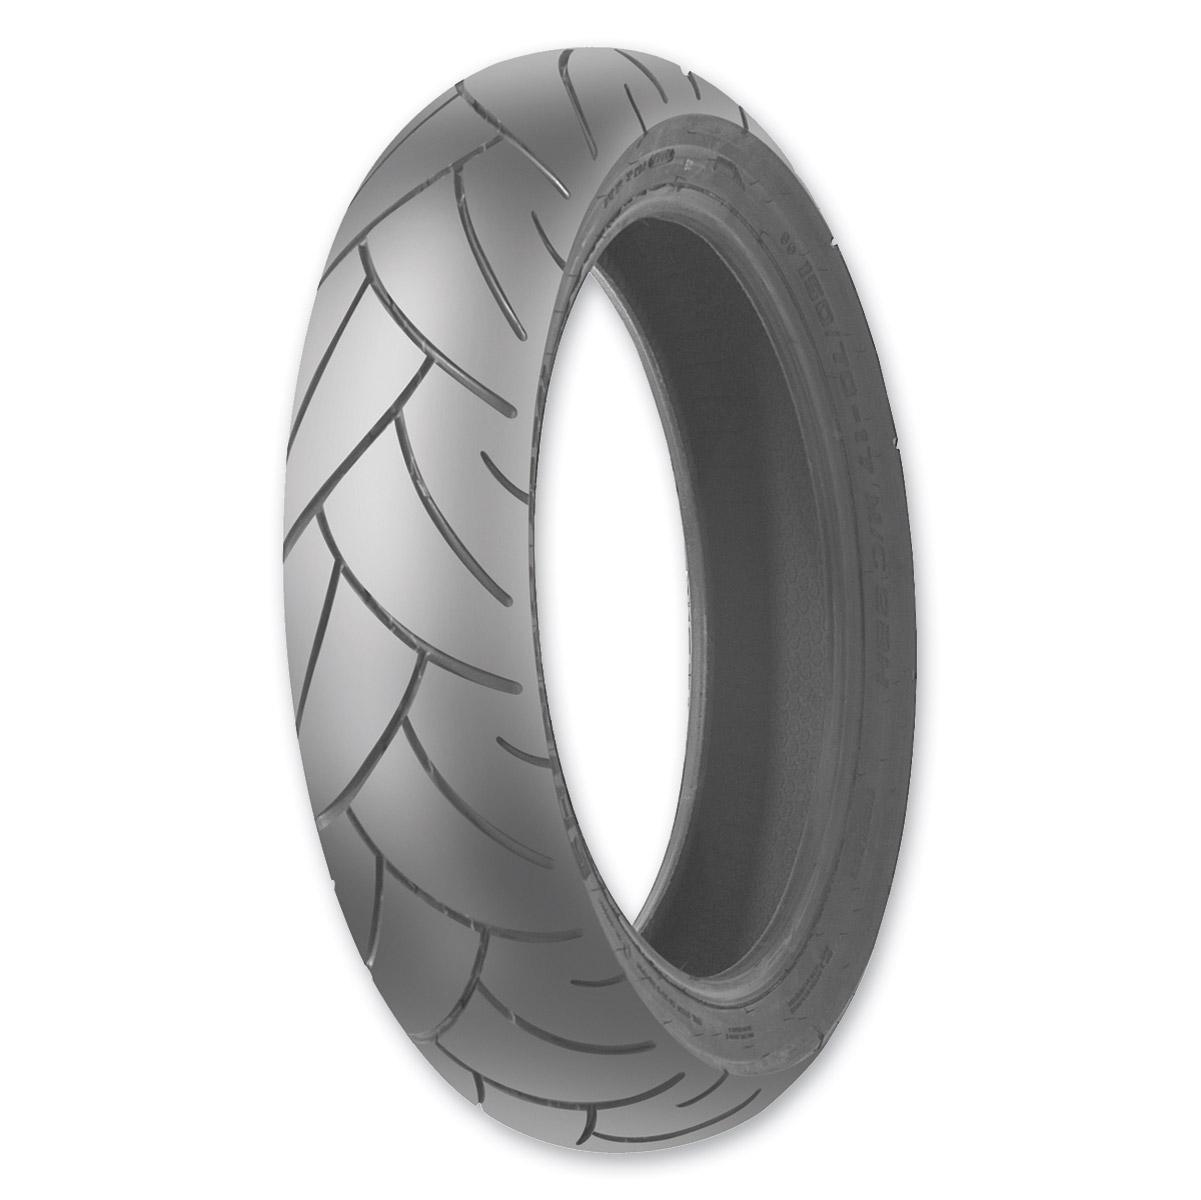 Shinko SR741 140/70-18 Rear Tire